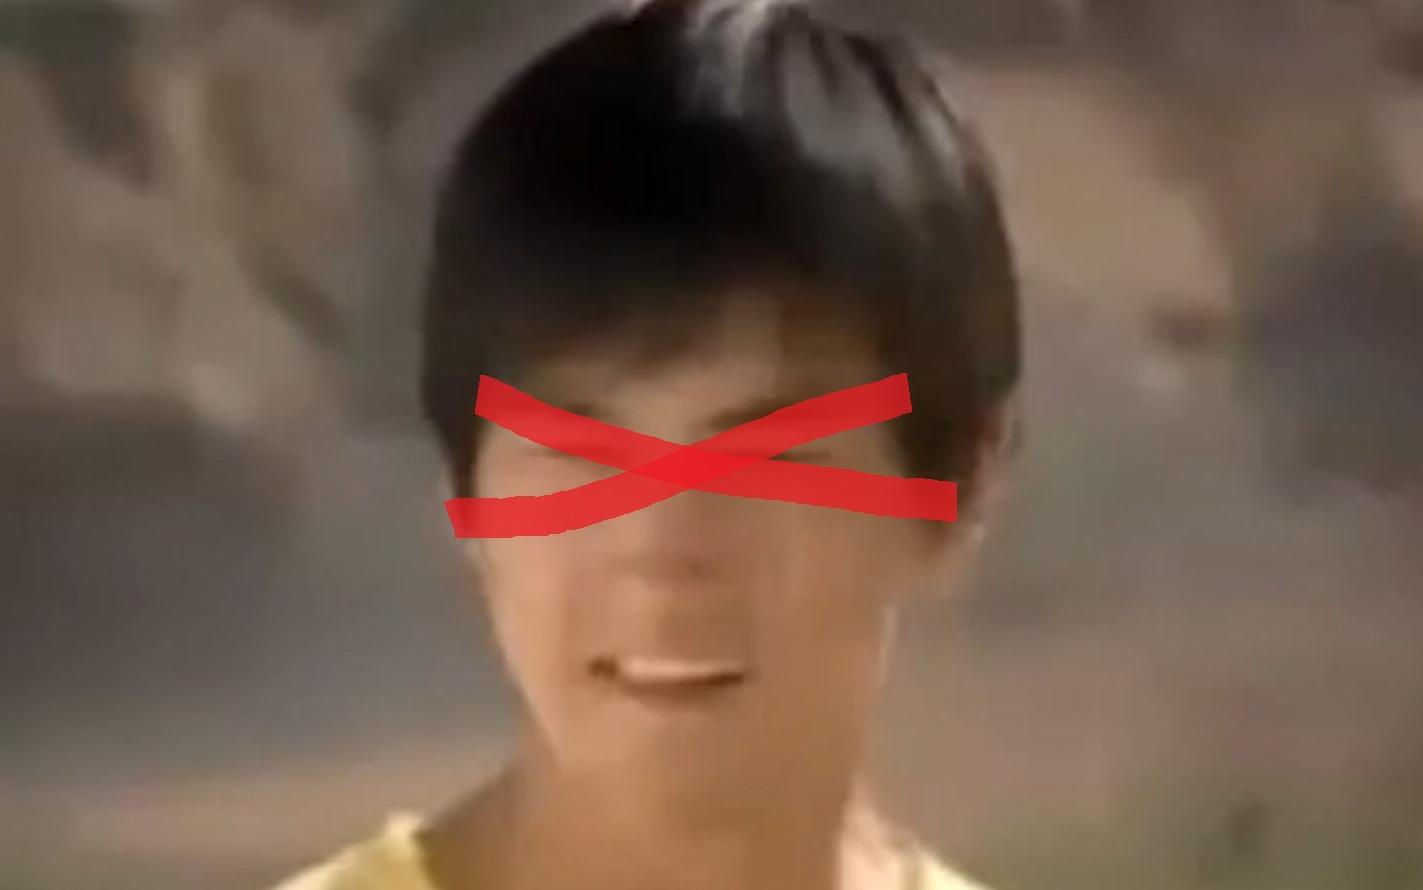 【qyqx】qyx重新加入战斗